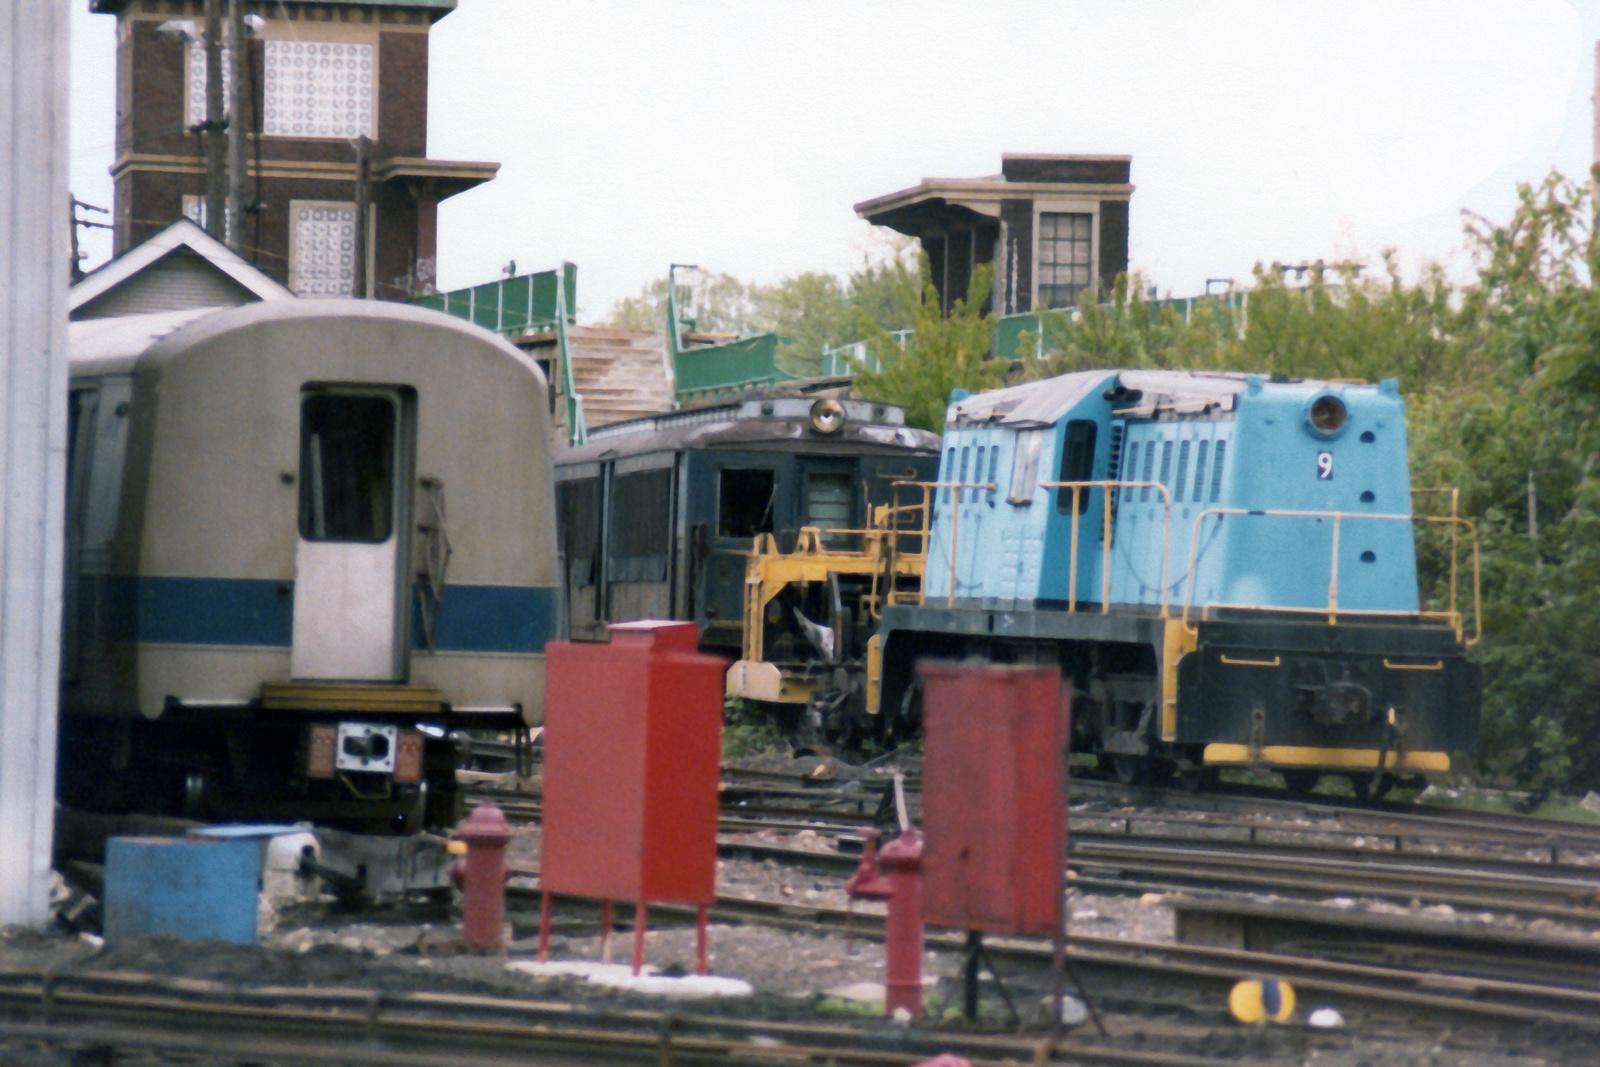 (646k, 1600x1067)<br><b>Country:</b> United States<br><b>City:</b> New York<br><b>System:</b> New York City Transit<br><b>Line:</b> SIRT<br><b>Location:</b> Clifton Yard/Shops <br><b>Car:</b> Whitcomb Locomotive 9 <br><b>Collection of:</b> Nicholas Fabrizio<br><b>Viewed (this week/total):</b> 4 / 292